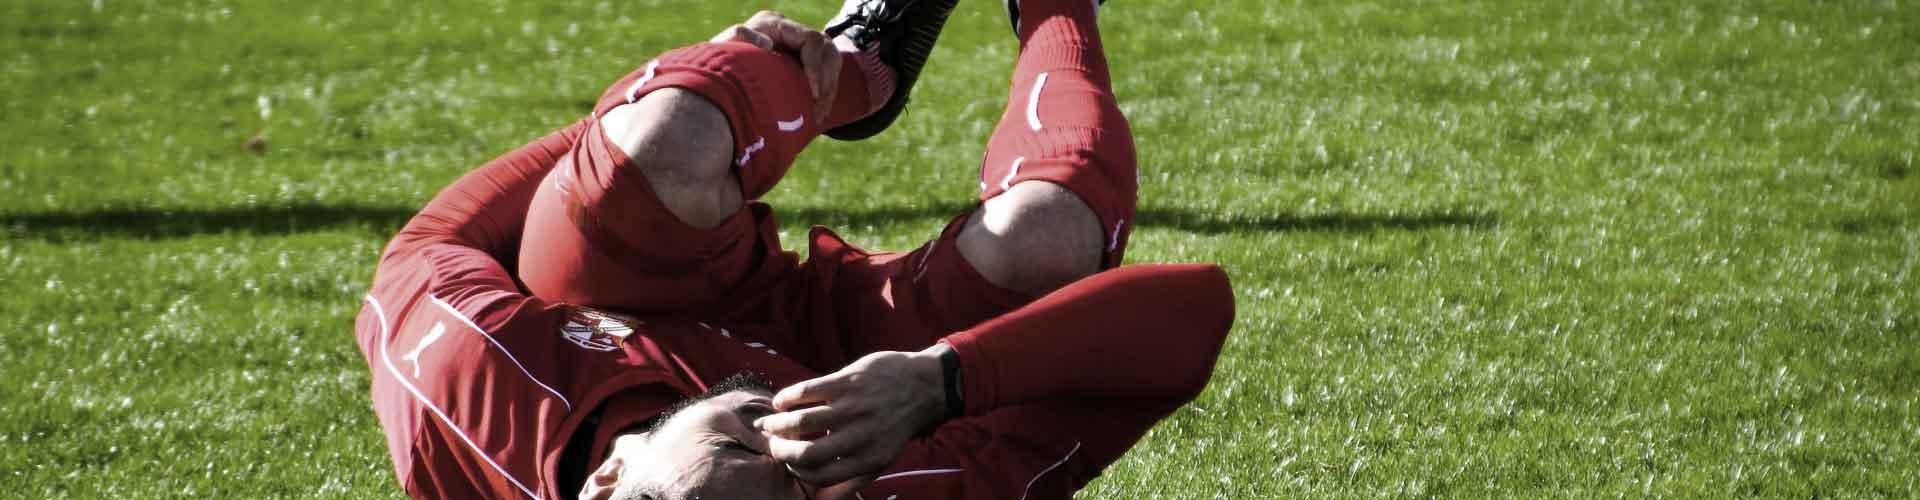 Lesions esportives